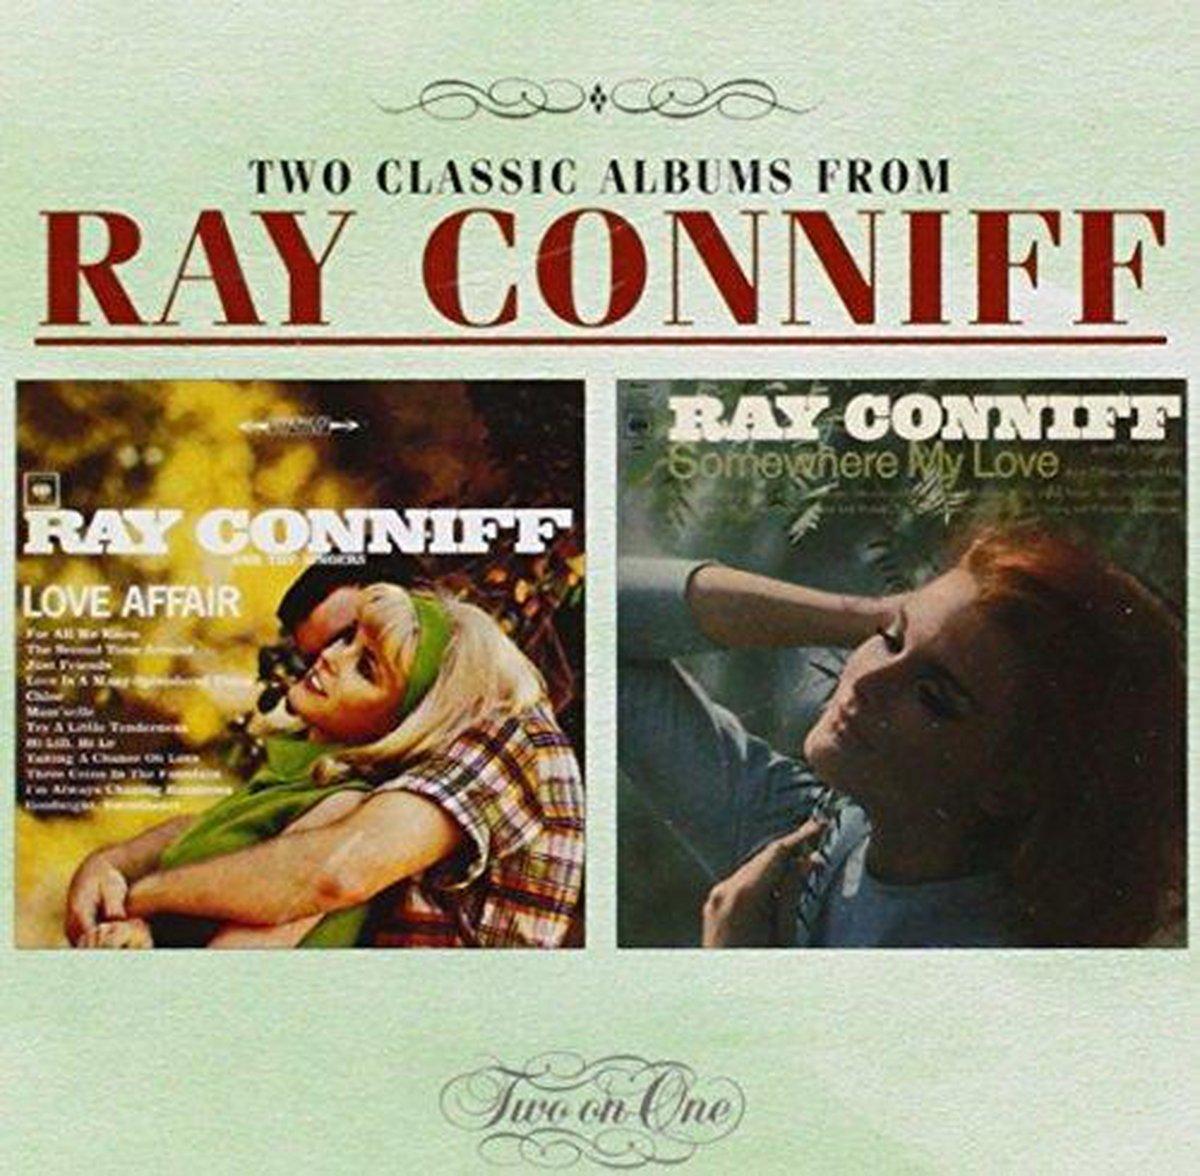 Love Affair - Ray Conniff